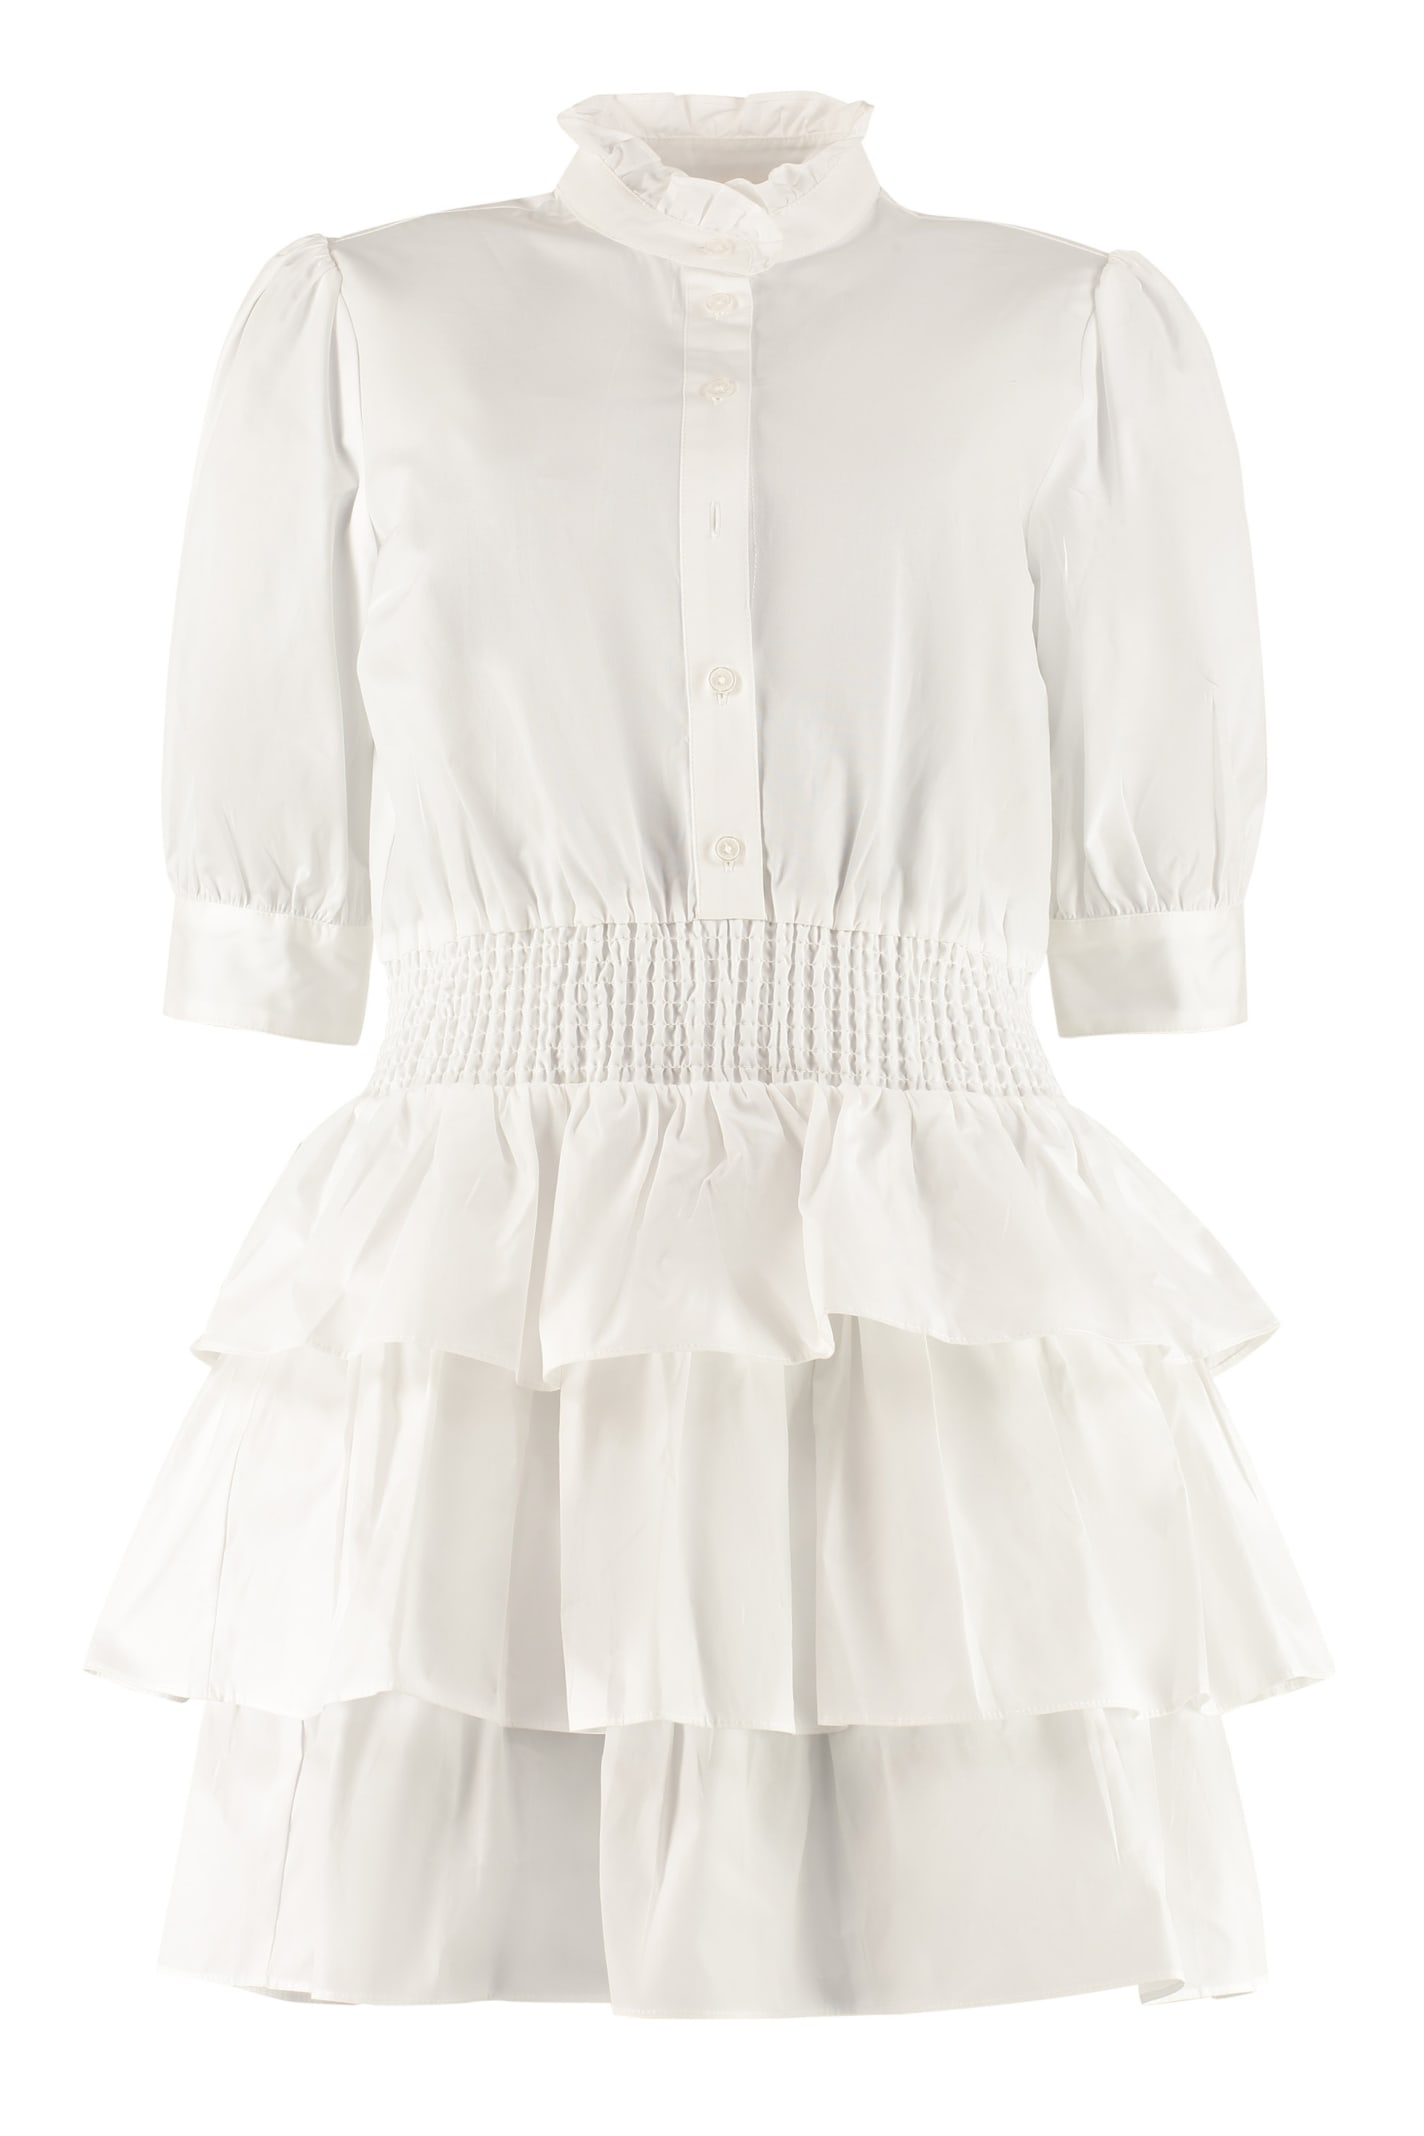 Buy MICHAEL Michael Kors Cotton Mini-dress online, shop MICHAEL Michael Kors with free shipping